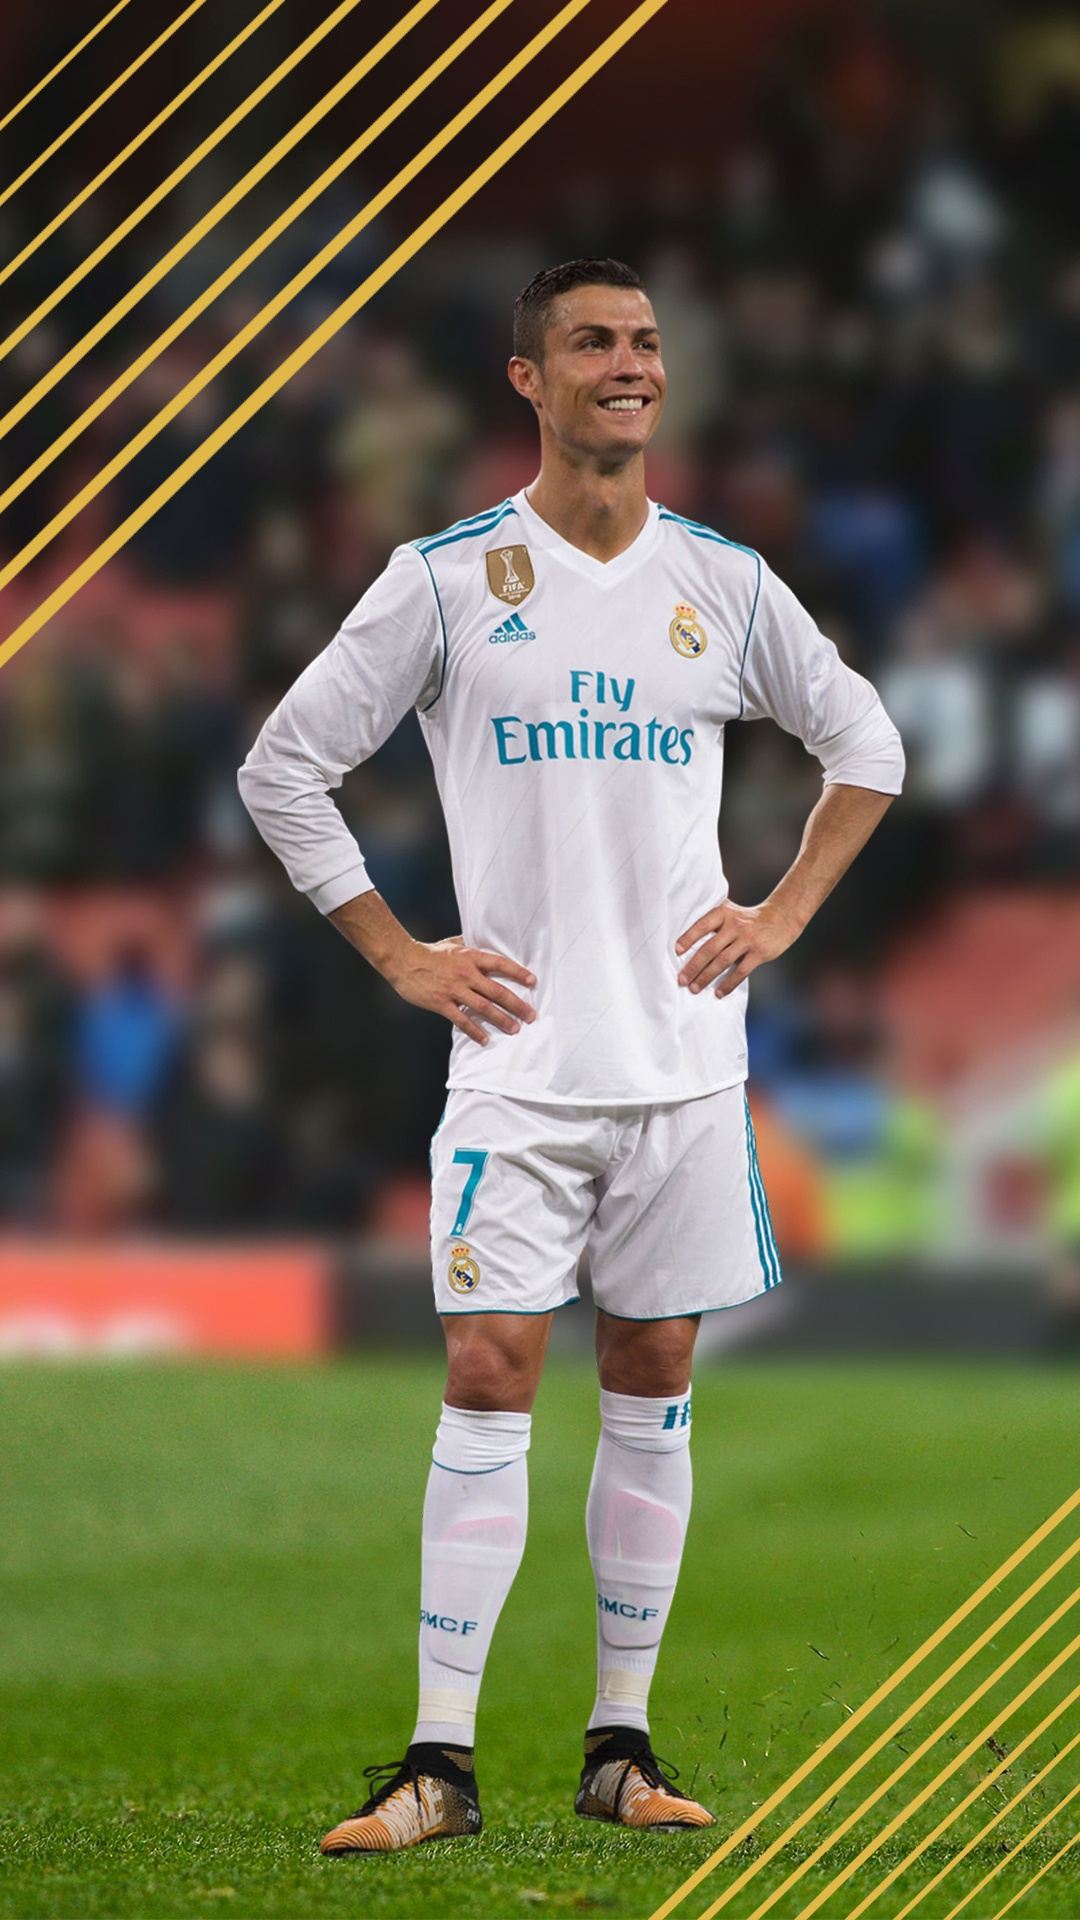 FIFA 18 Ronaldo Smartphone Wallpaper